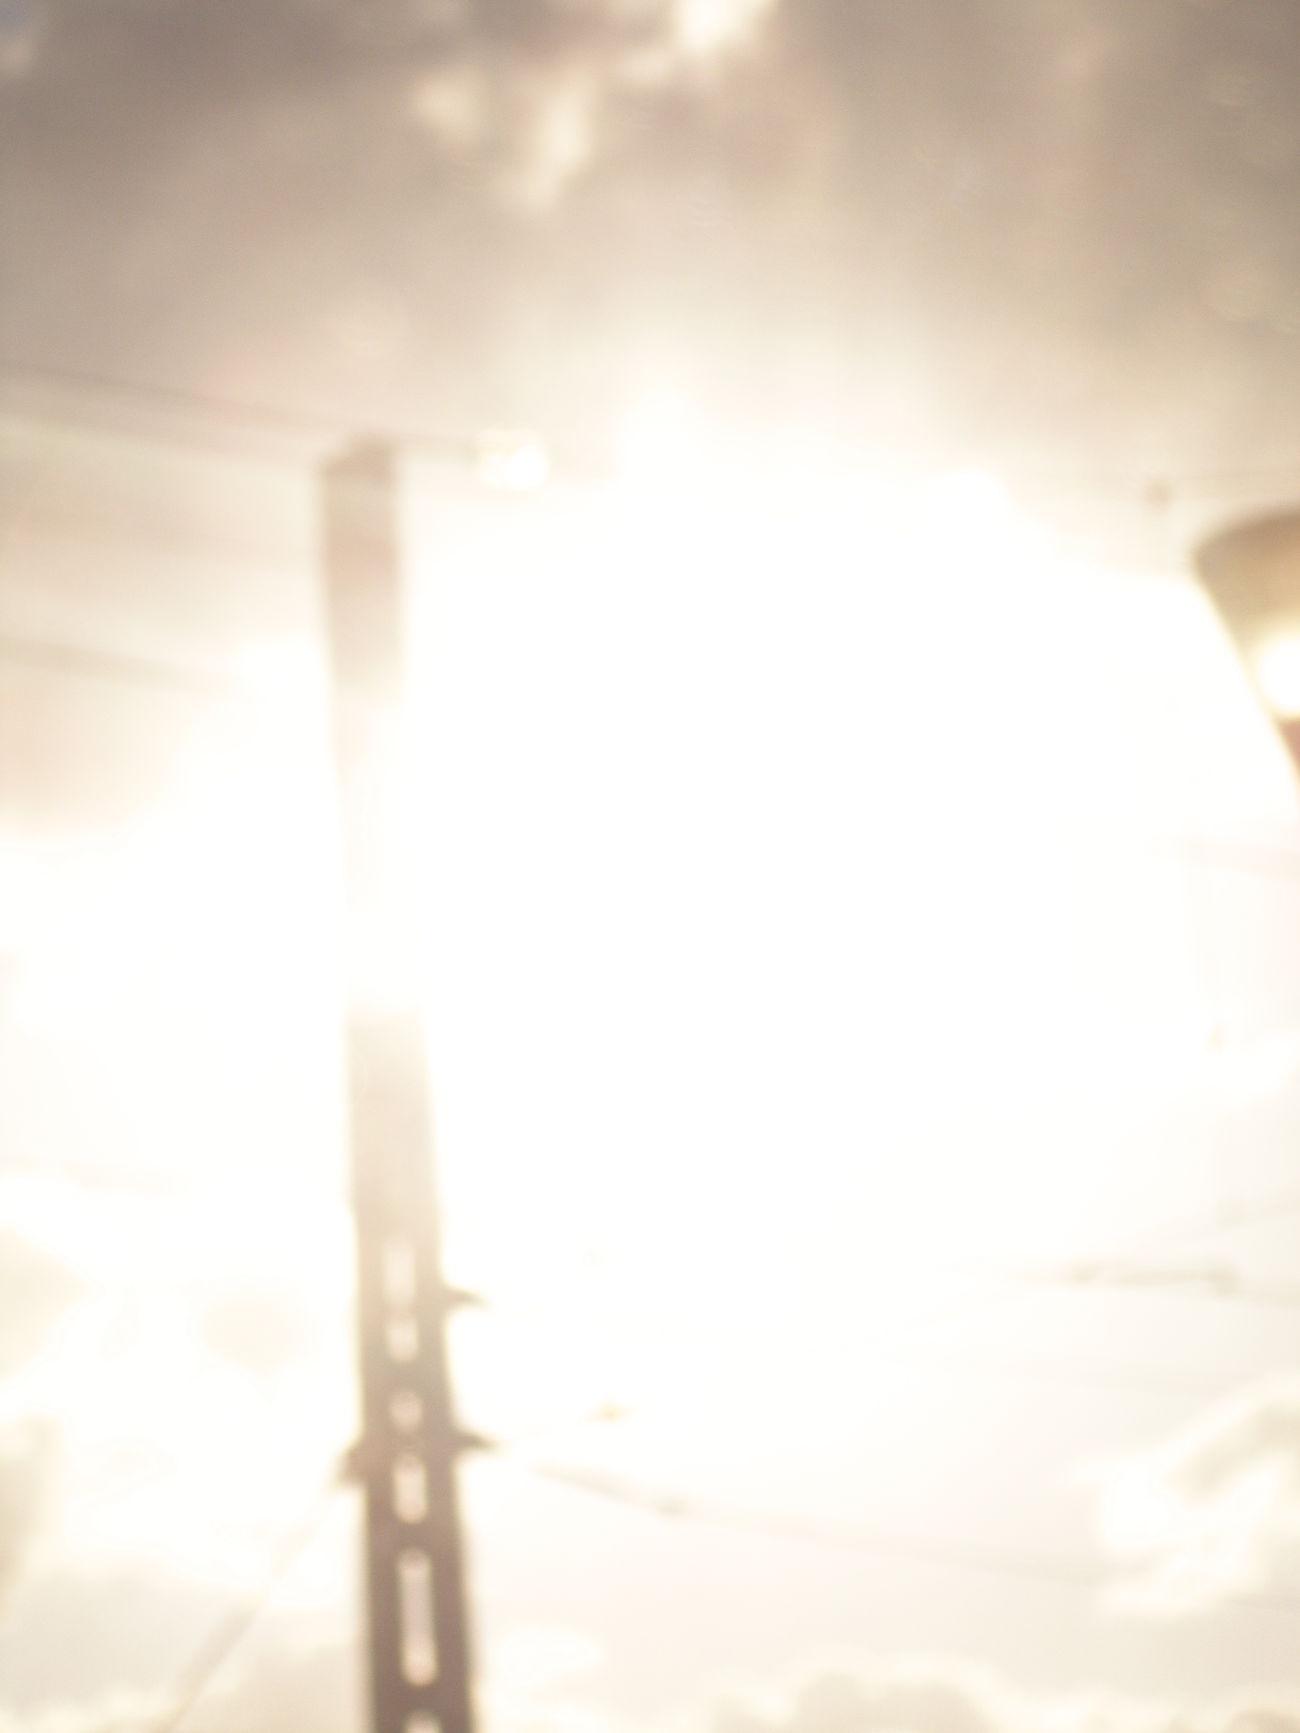 Suena 🎶🎧 Páginas tuyas. FabiánTranquilidad Tranquility Antenas Lights Luces Light Luz Blanco White Tesis99 Window Ventanilla Ventana View Vistas Tren Train Travel Viajar Trayecto Route Routes Blurred Transport Sun